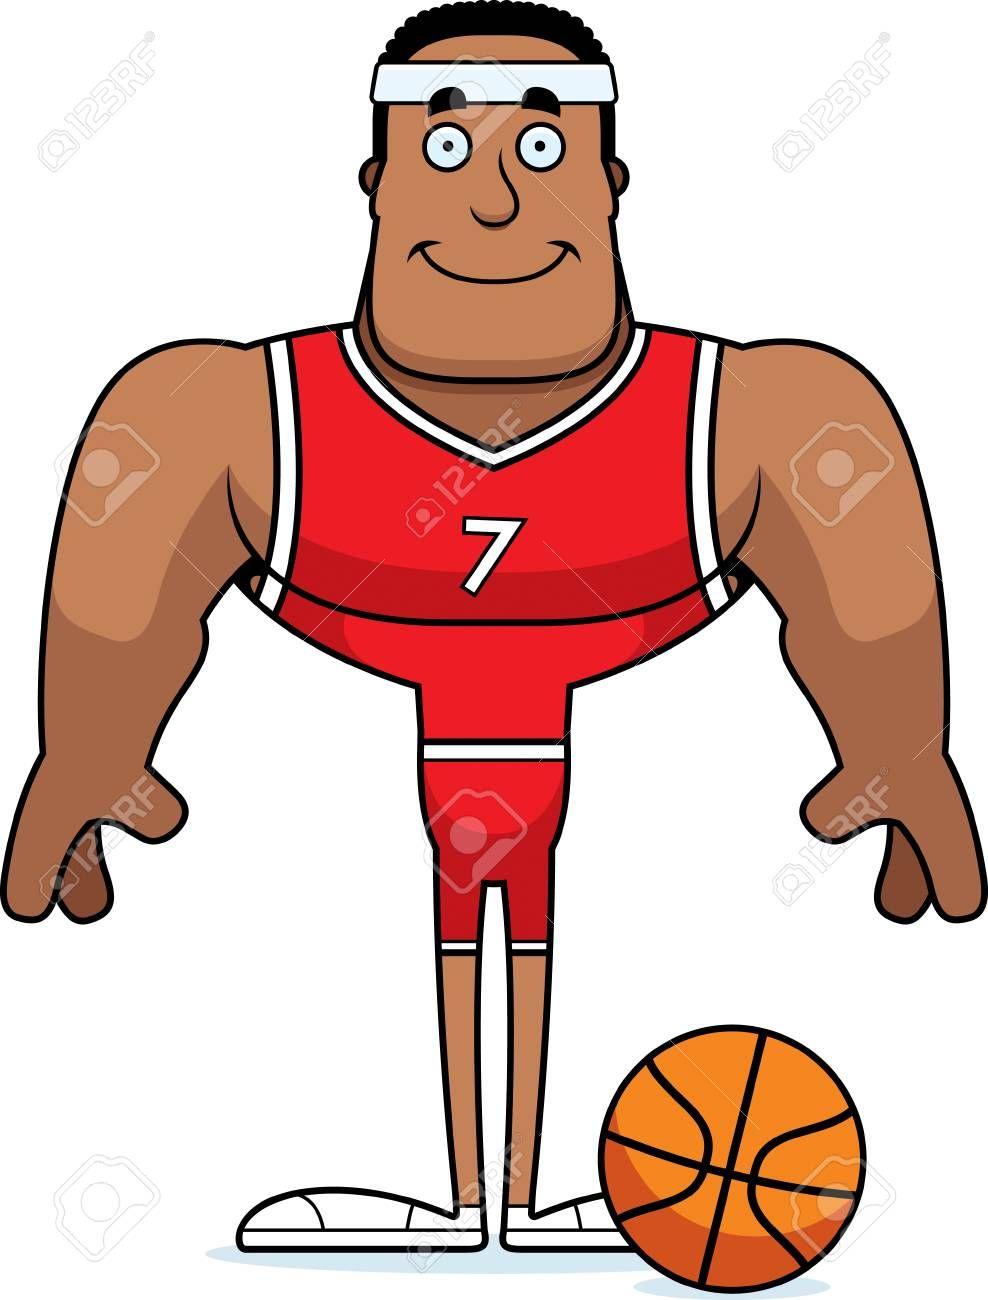 A Cartoon Basketball Player Smiling Illustration Sponsored Basketball Cartoon Player Illustration Smiling Basketball Players Cartoon A Cartoon